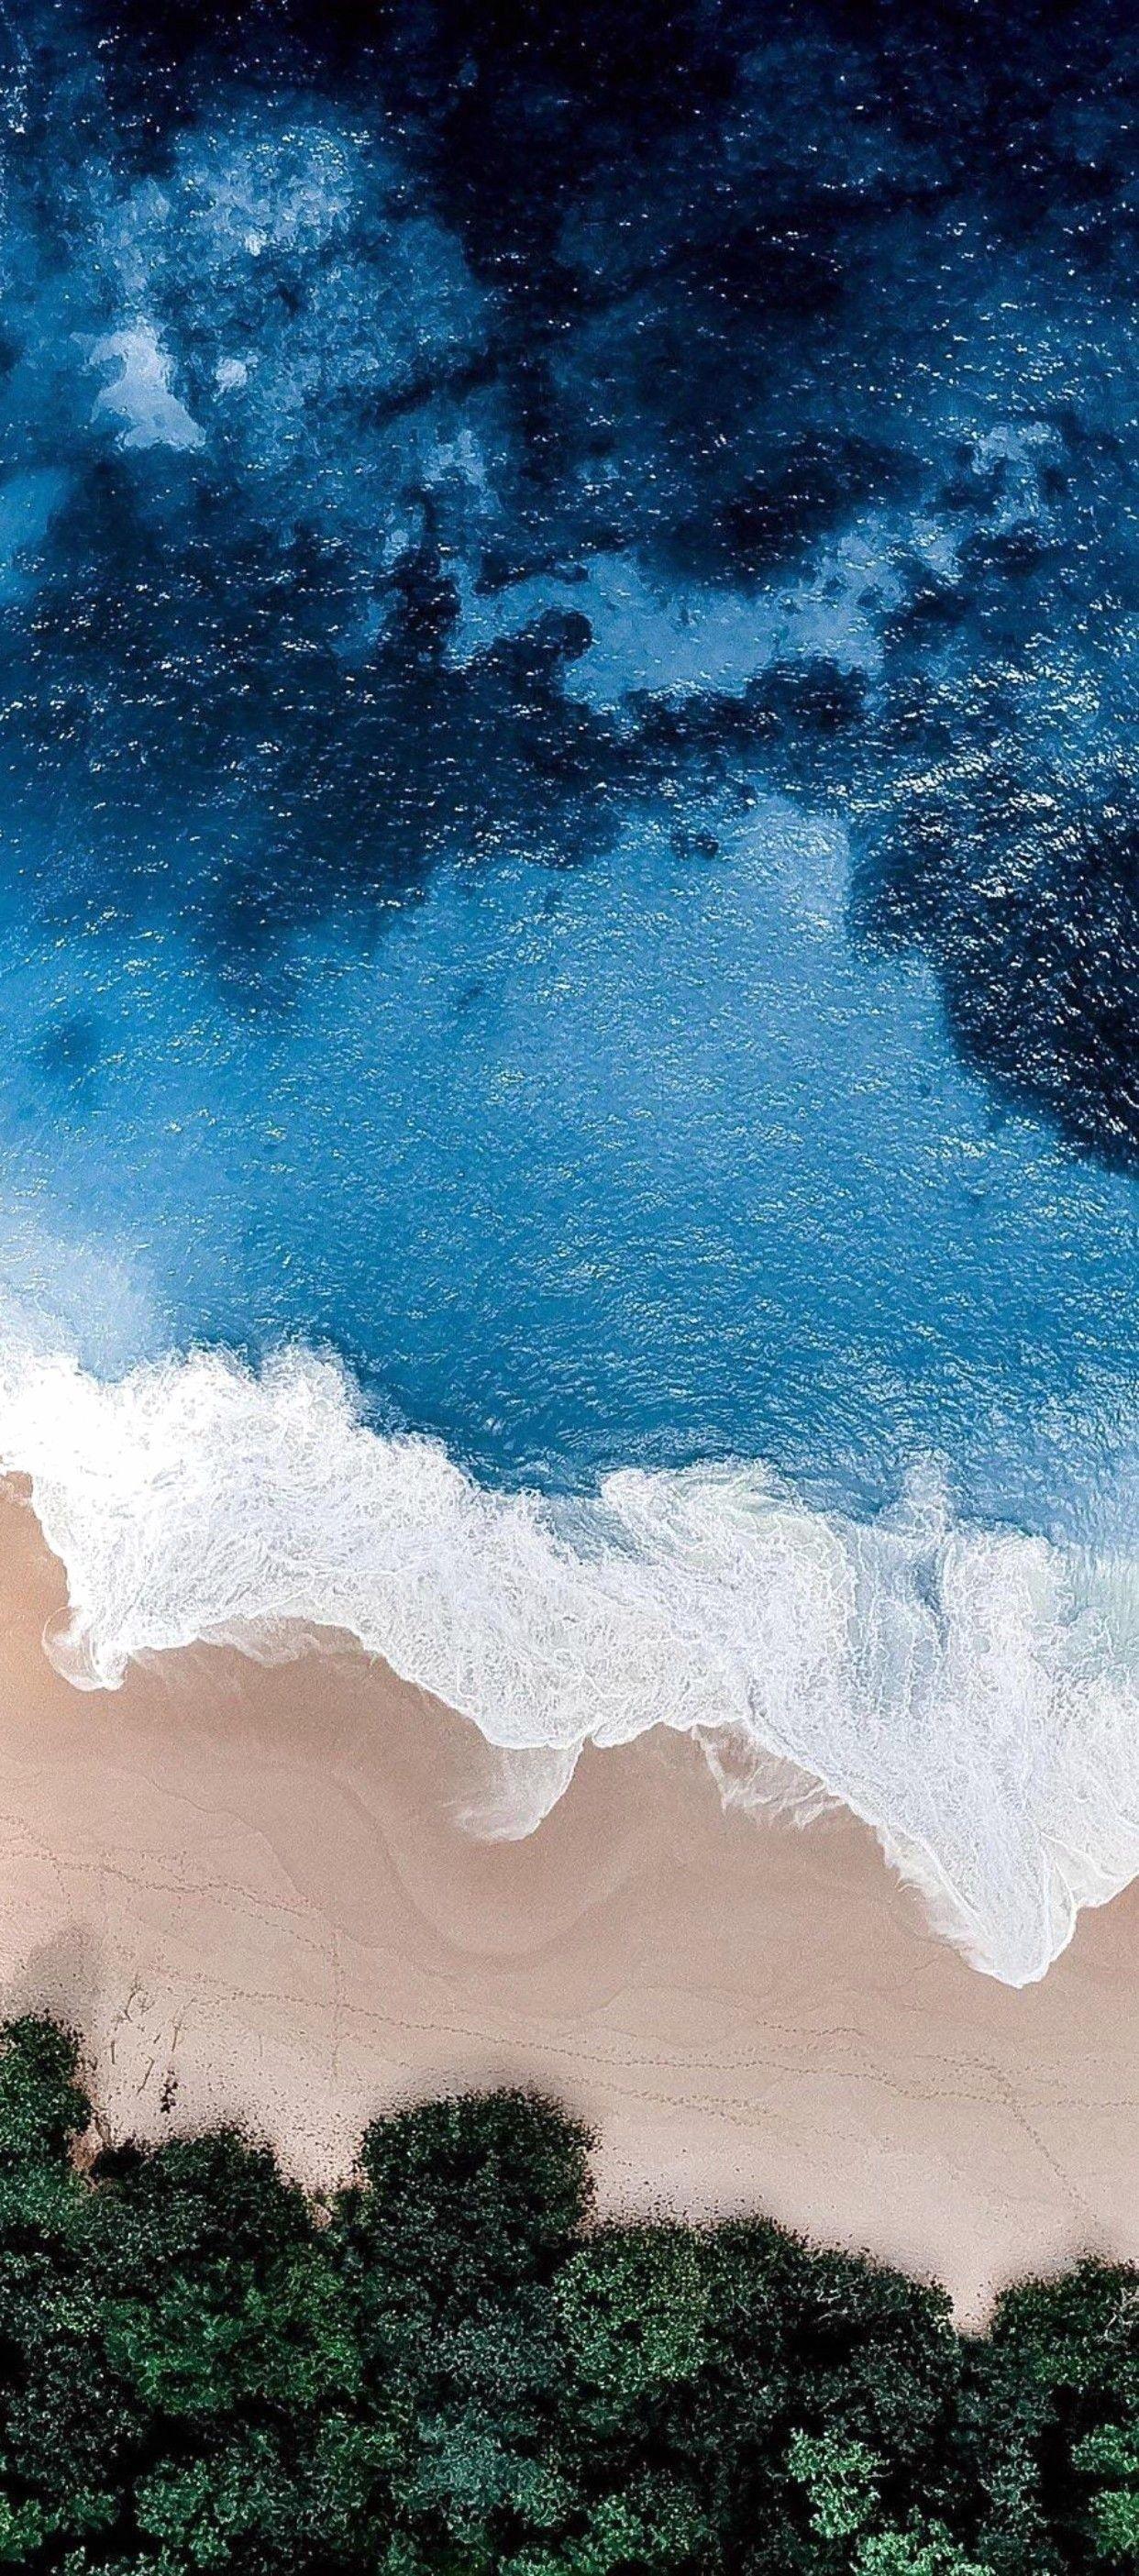 Iphone X 4k Wallpapers Wallpaper Cave